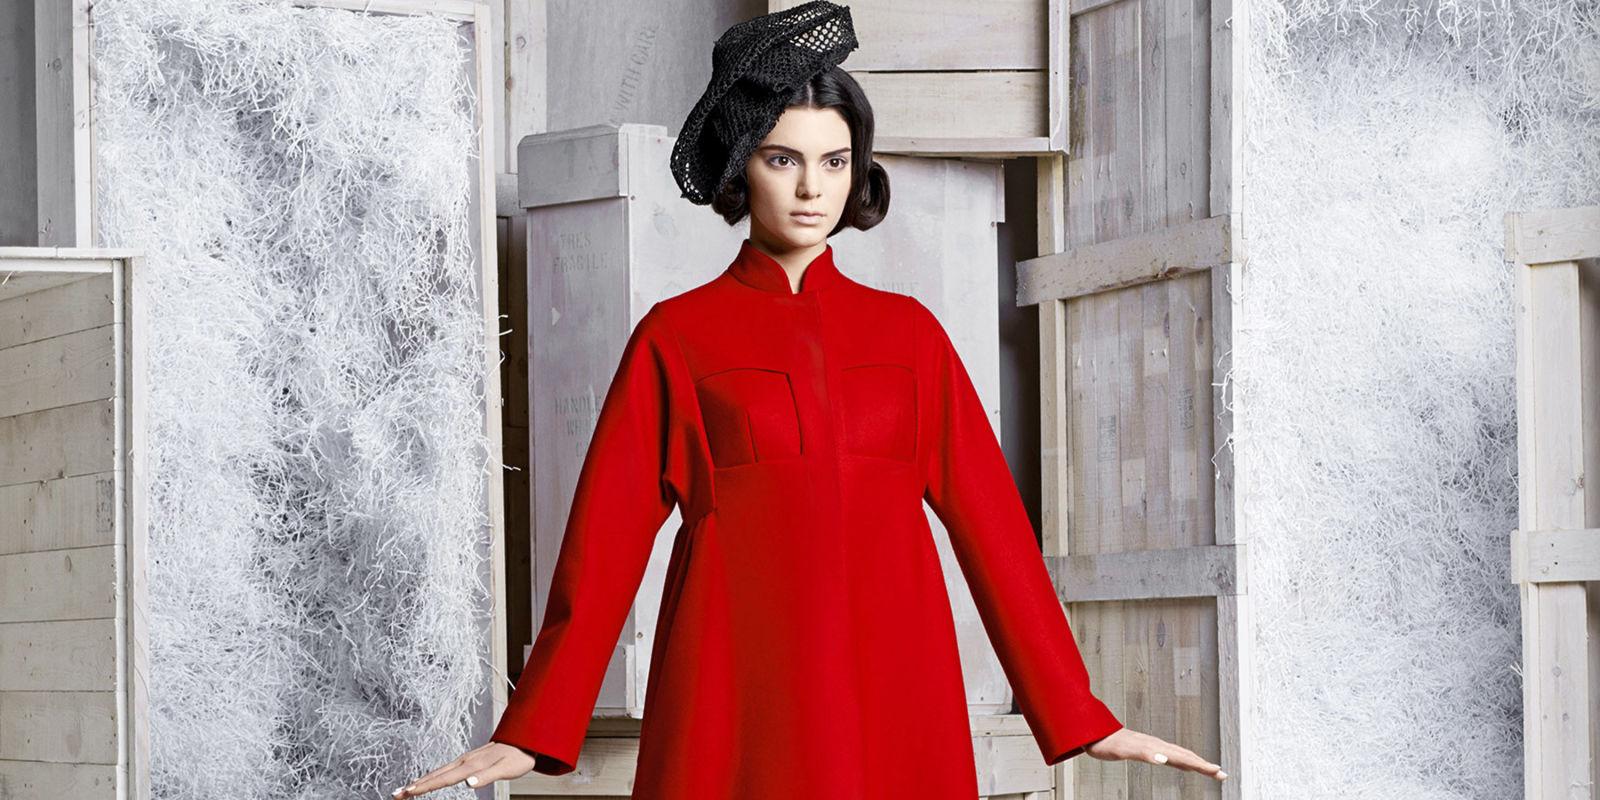 Что Кендалл Дженнер думает о стиле Ким Кардашьян и Каре Делевинь